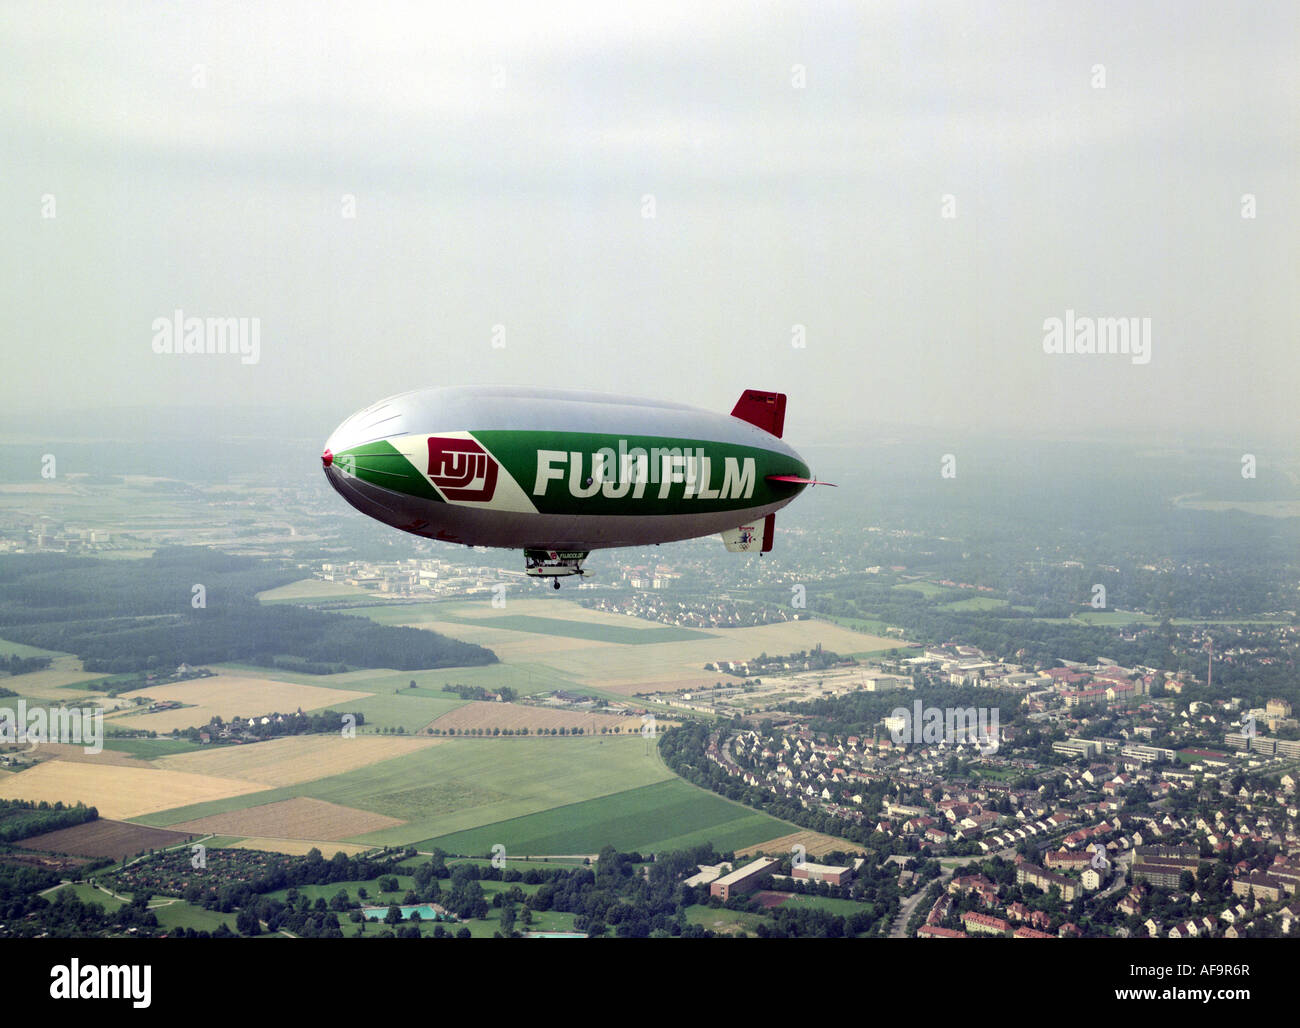 Fuji blimp over Germany, Germany - Stock Image